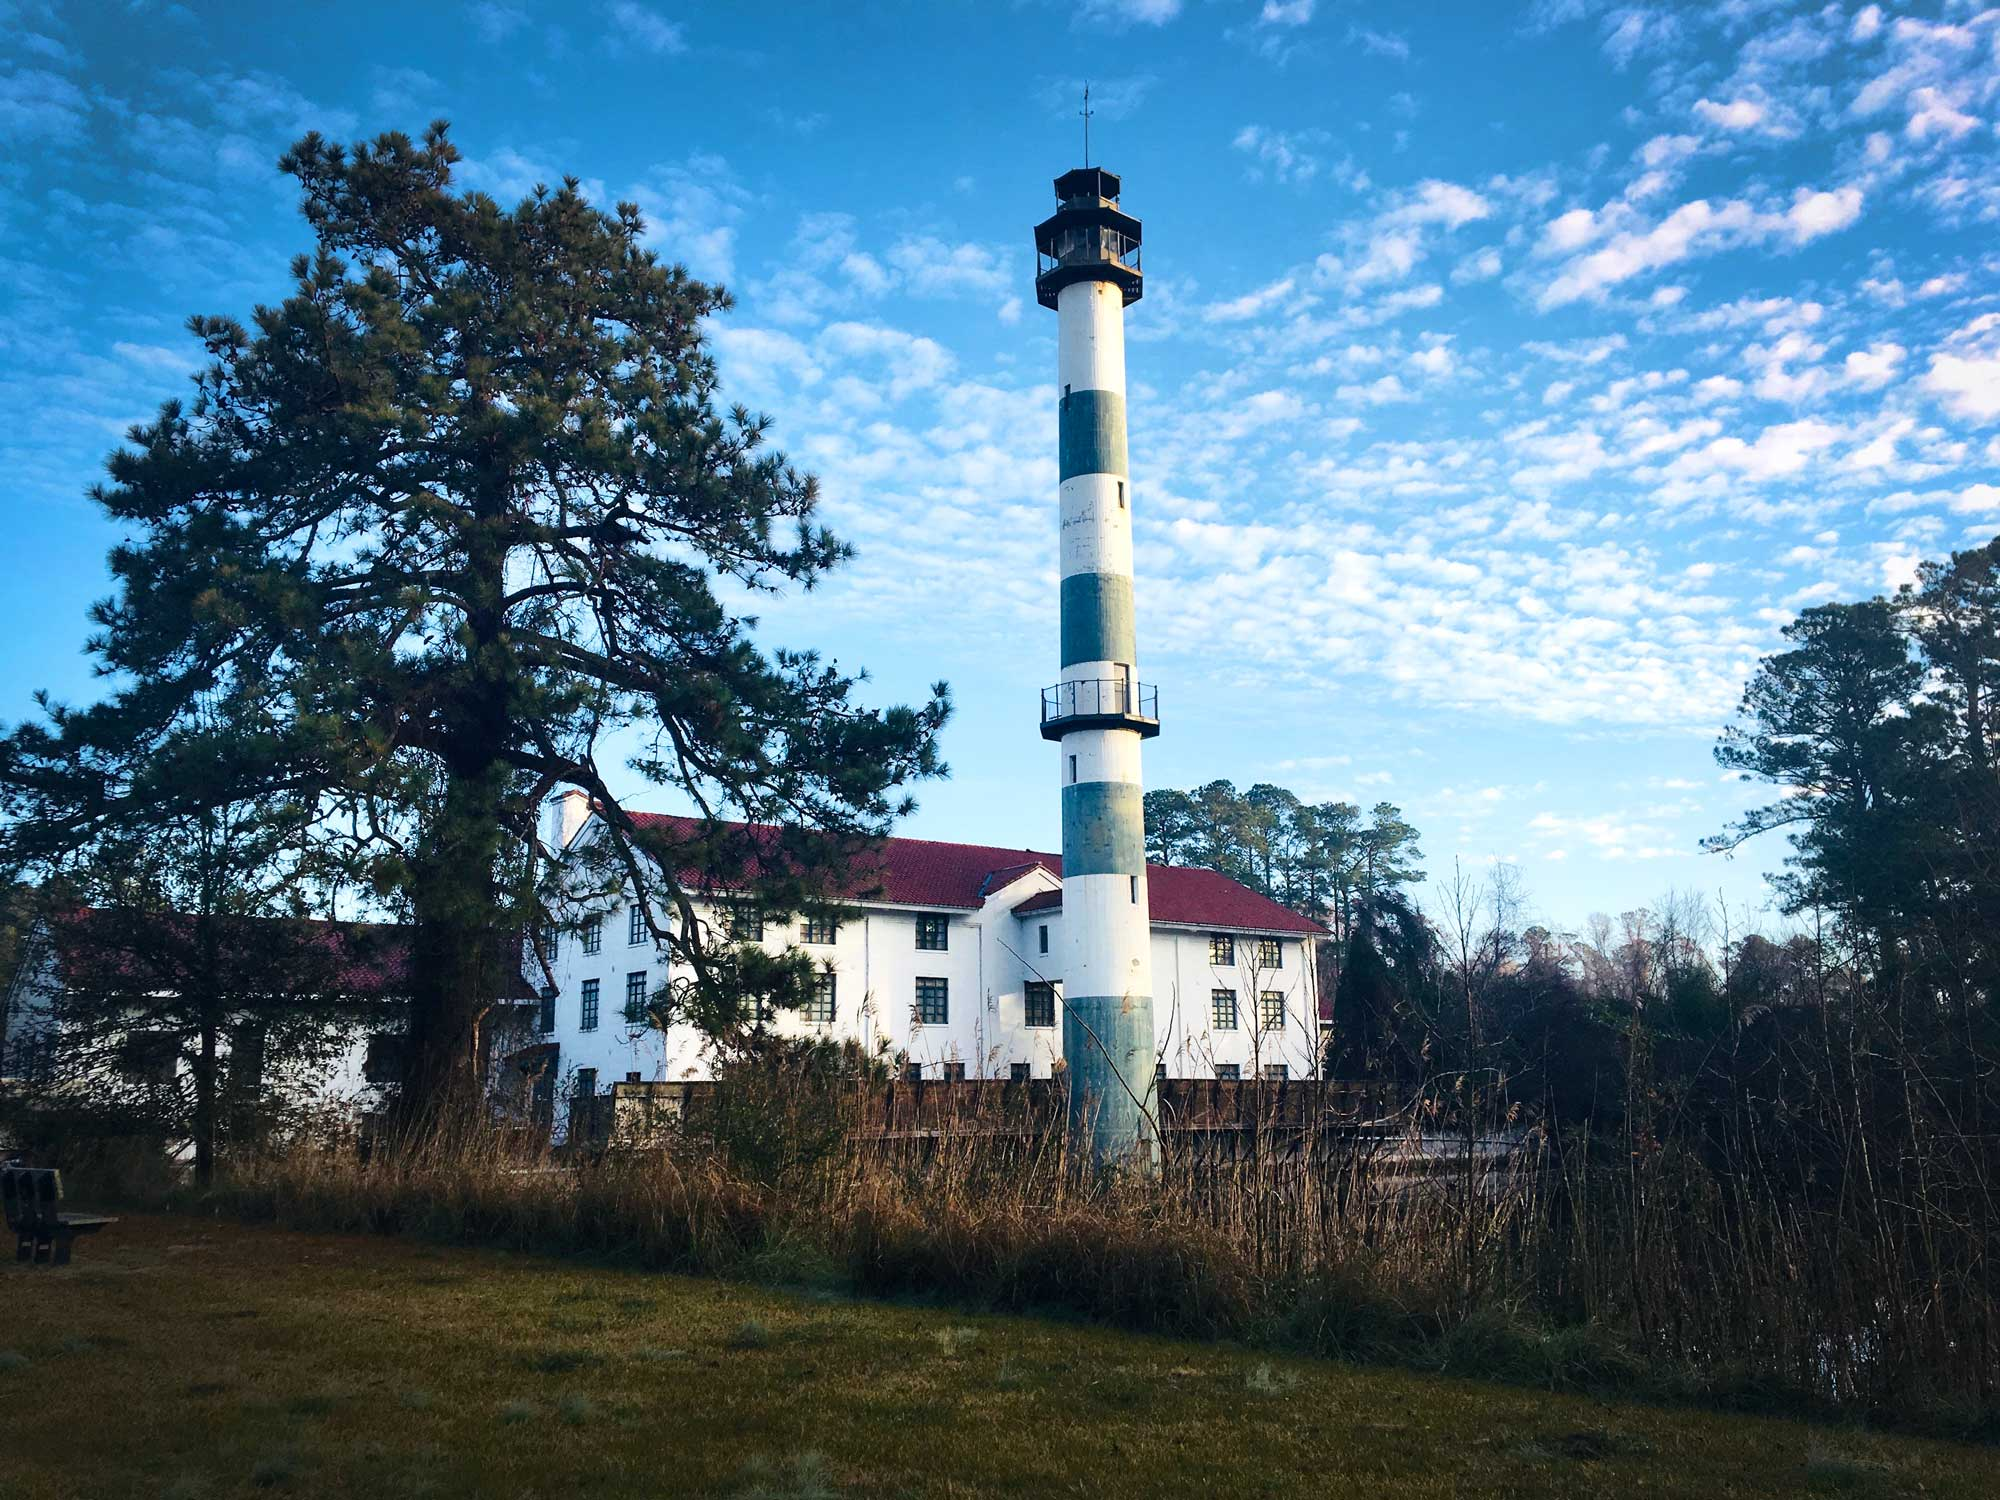 Former hunting lodge and observation tower at Mattamuskeet National Wildlife Refuge, North Carolina